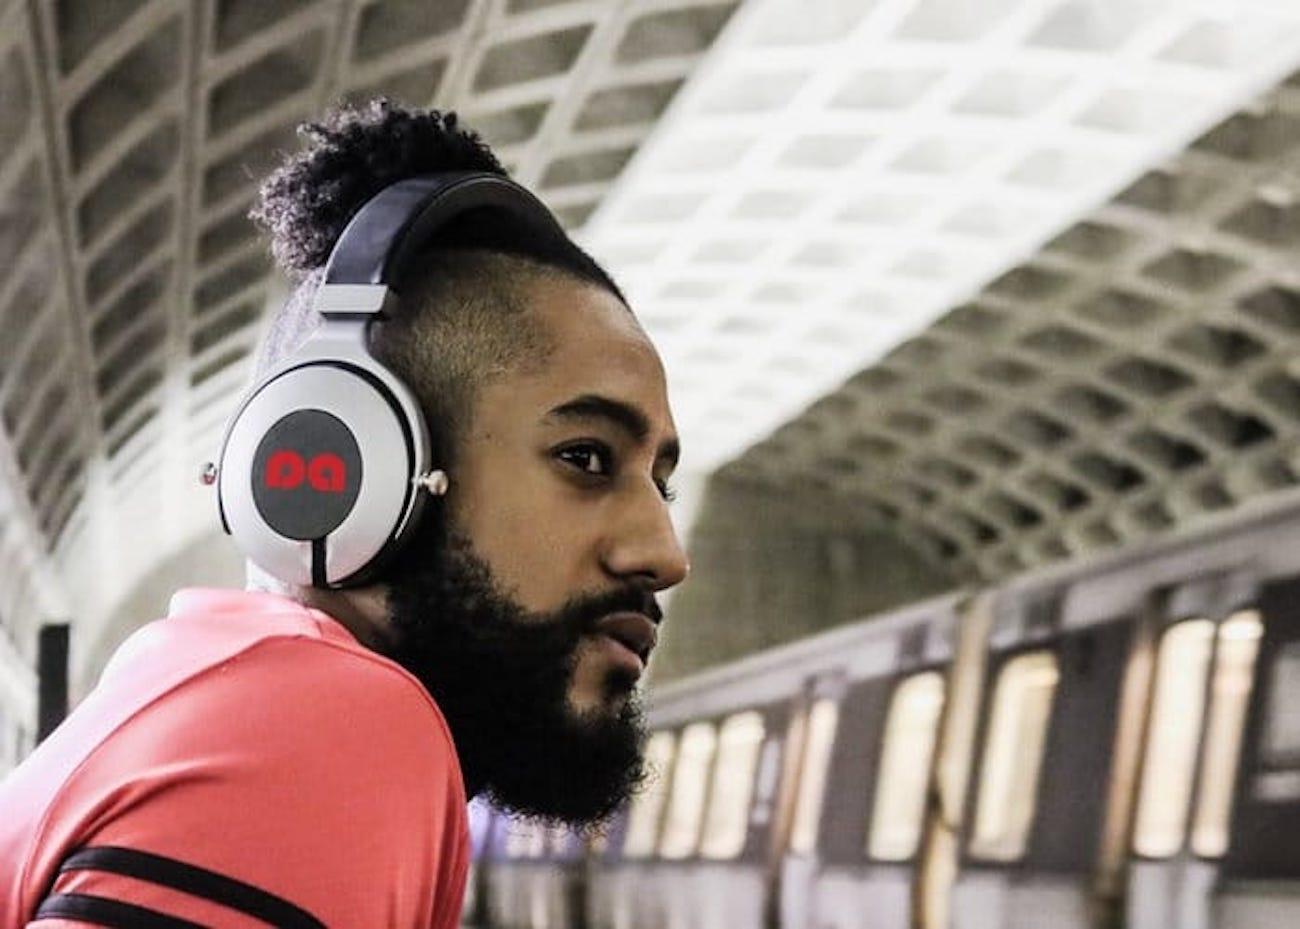 ZaanU Earbud Convertible Headphones